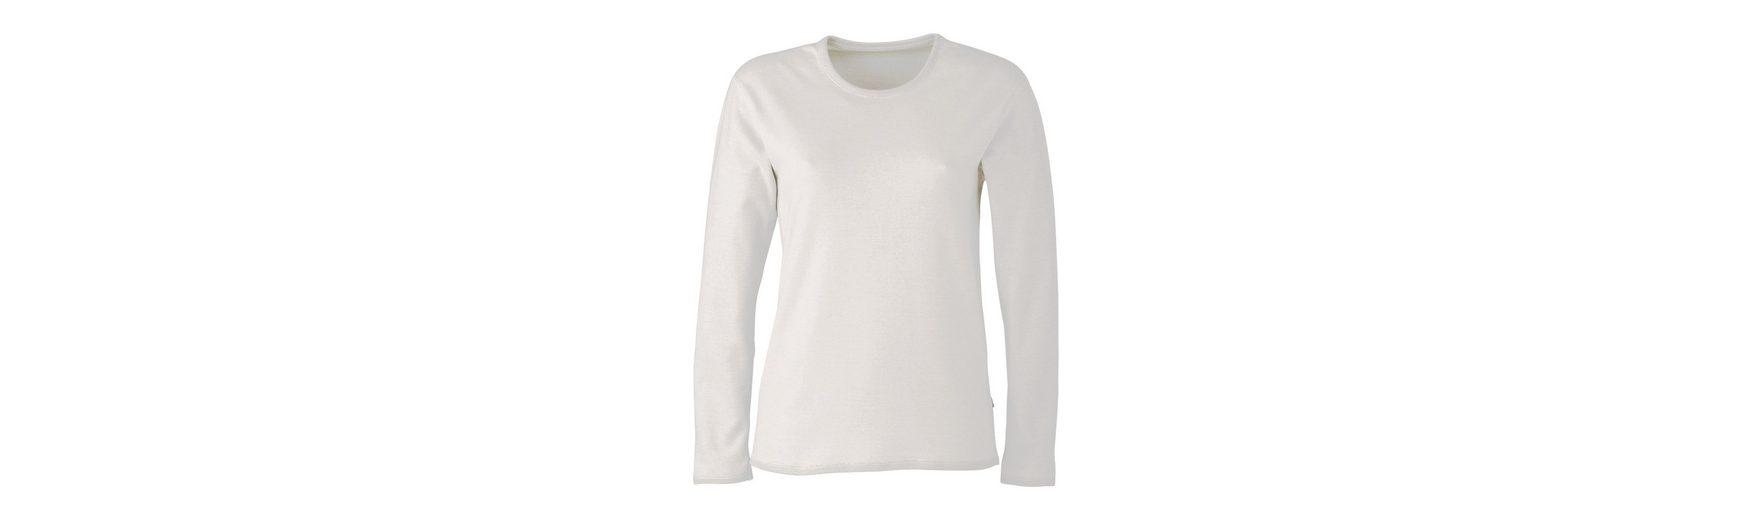 Funktions TRIGEMA Langarm Shirt TRIGEMA TRIGEMA Shirt TRIGEMA Langarm Langarm Funktions Funktions Funktions Shirt Langarm Shirt PptUBp